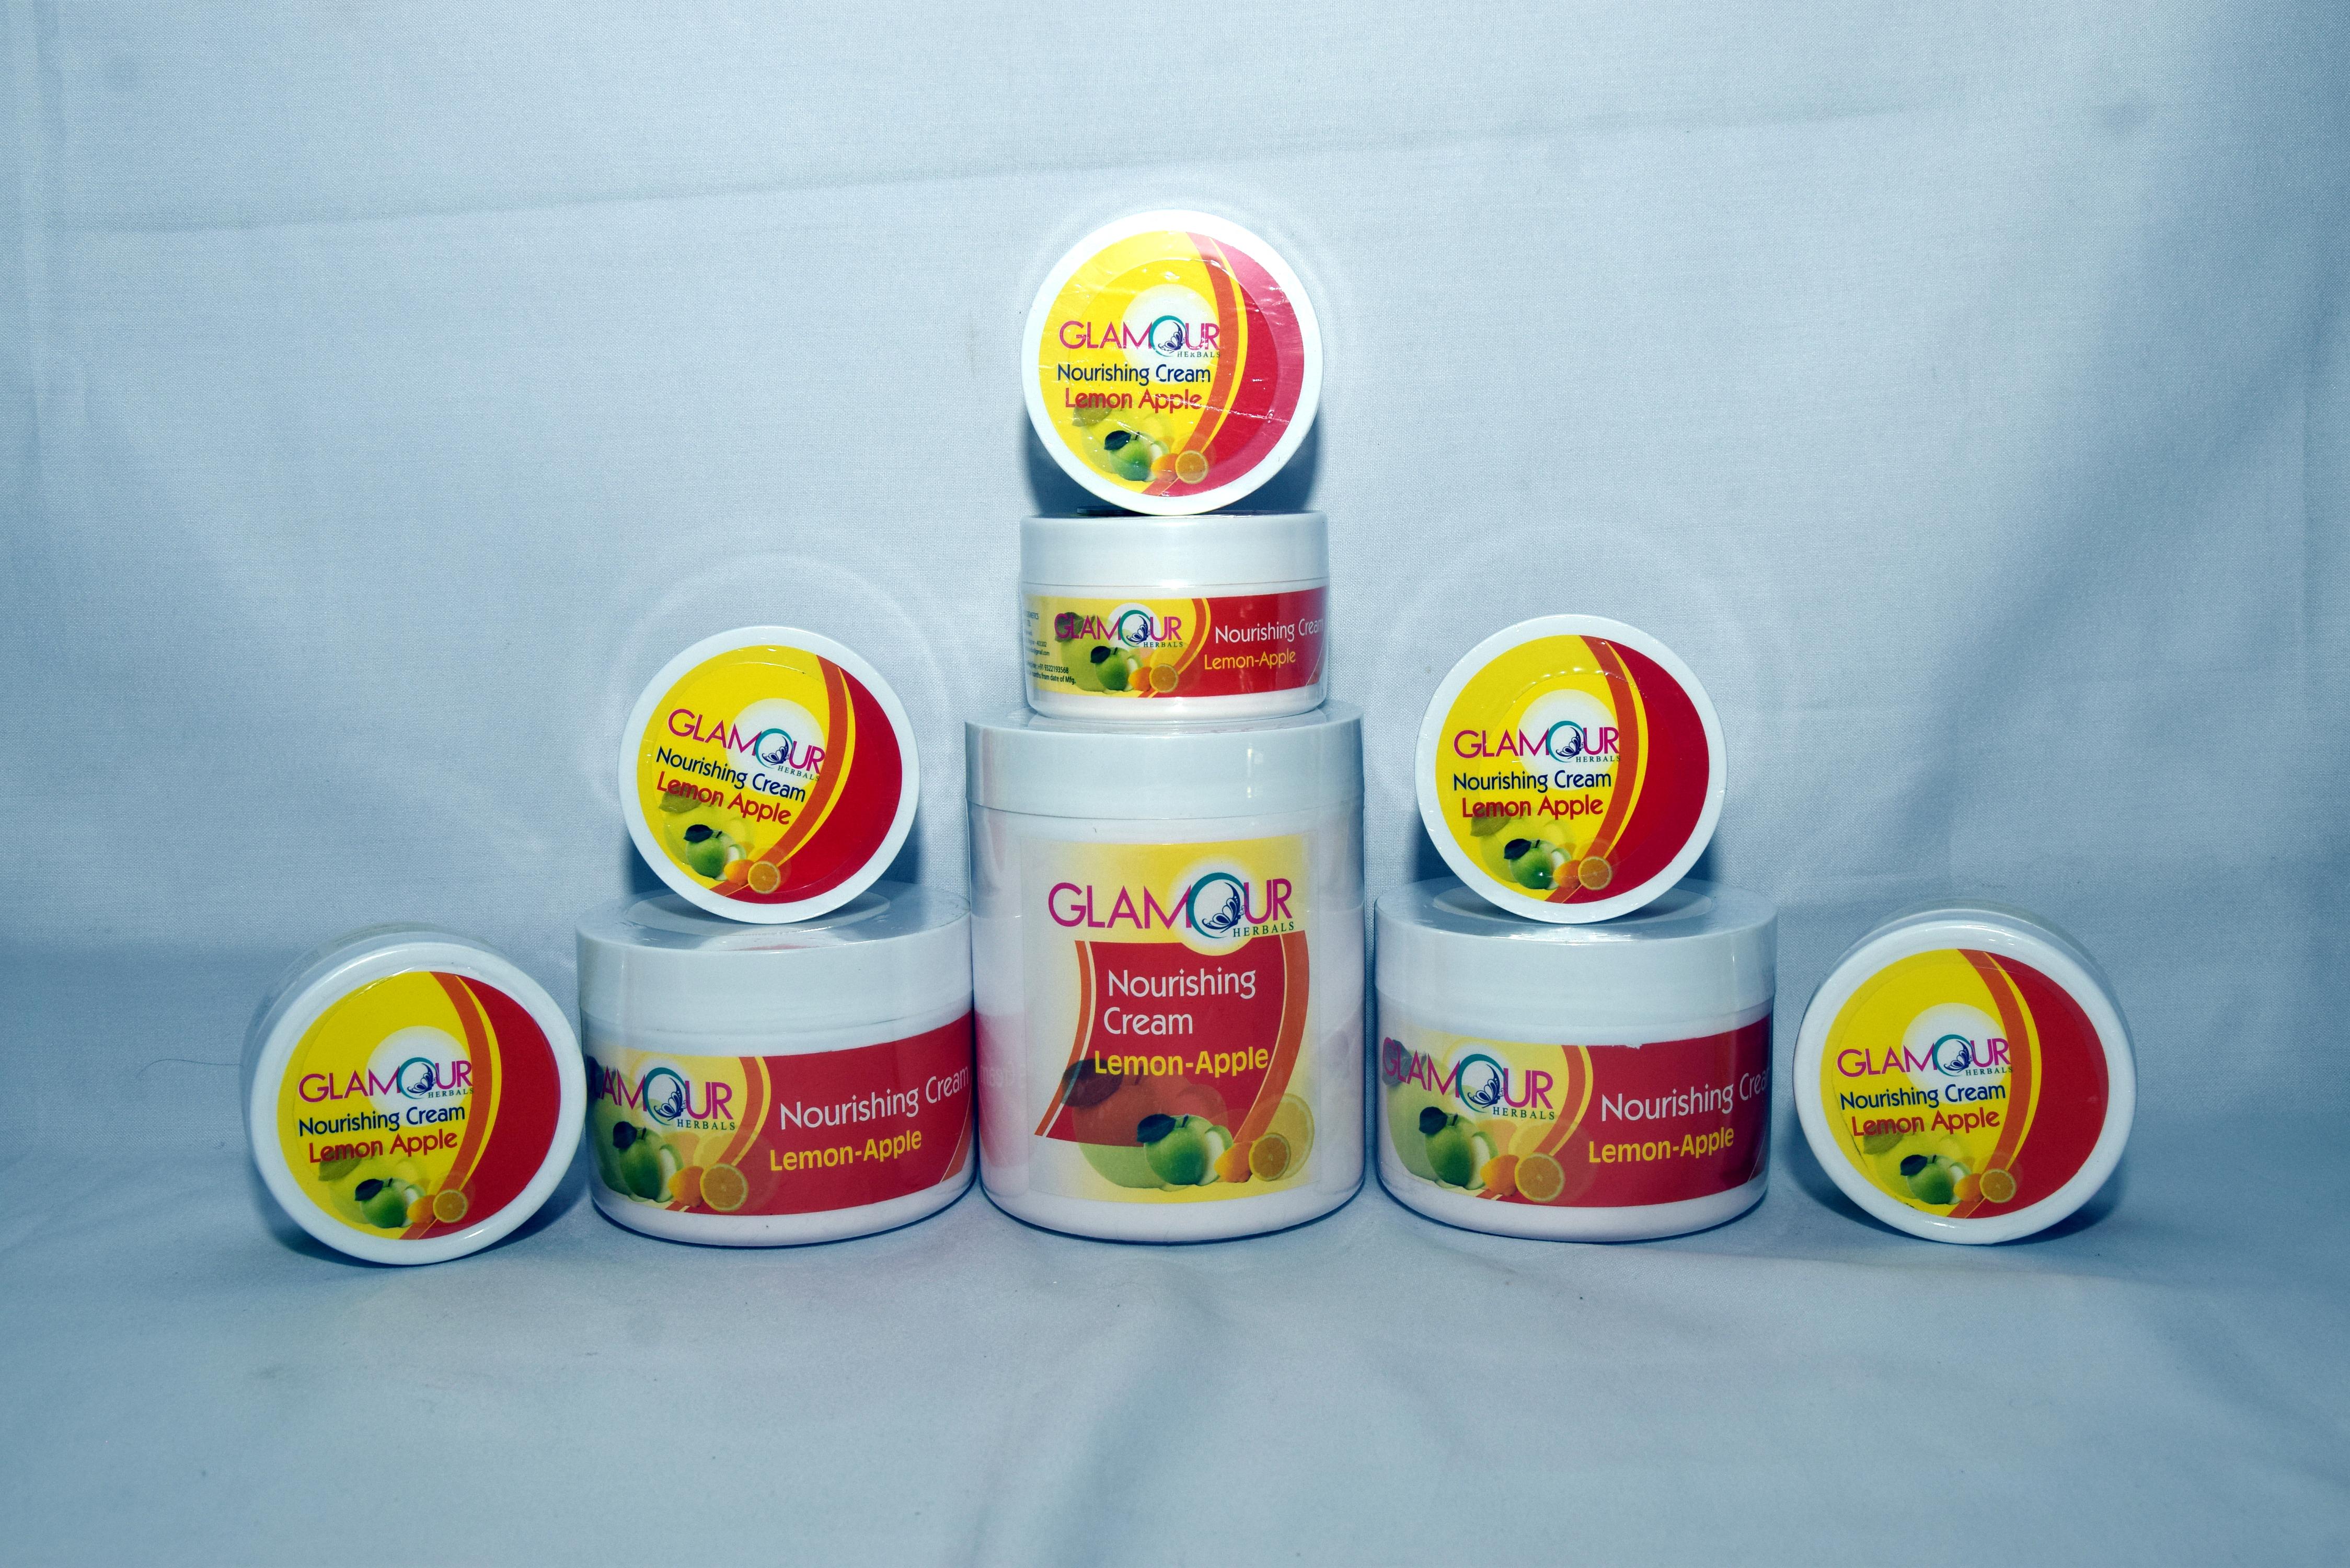 Glamour Almond-Milk Nourishing Cream